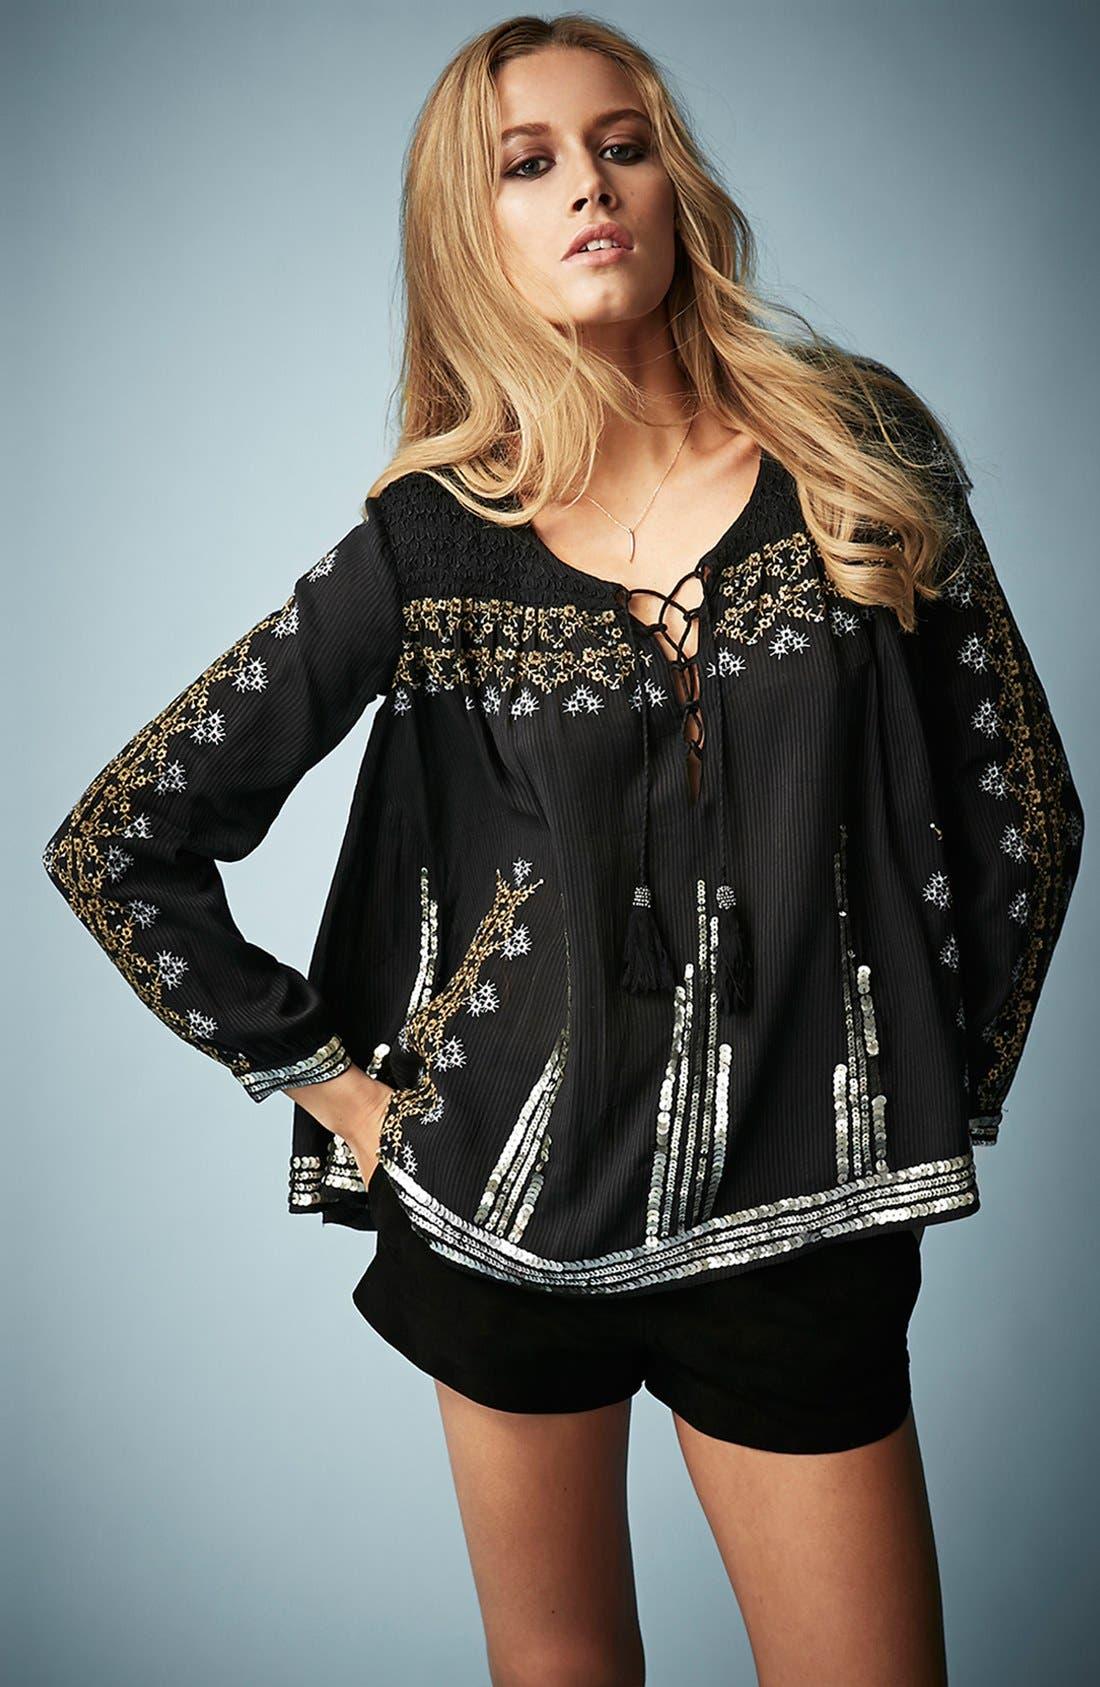 Alternate Image 1 Selected - Kate Moss for Topshop Folk Smocked Blouse